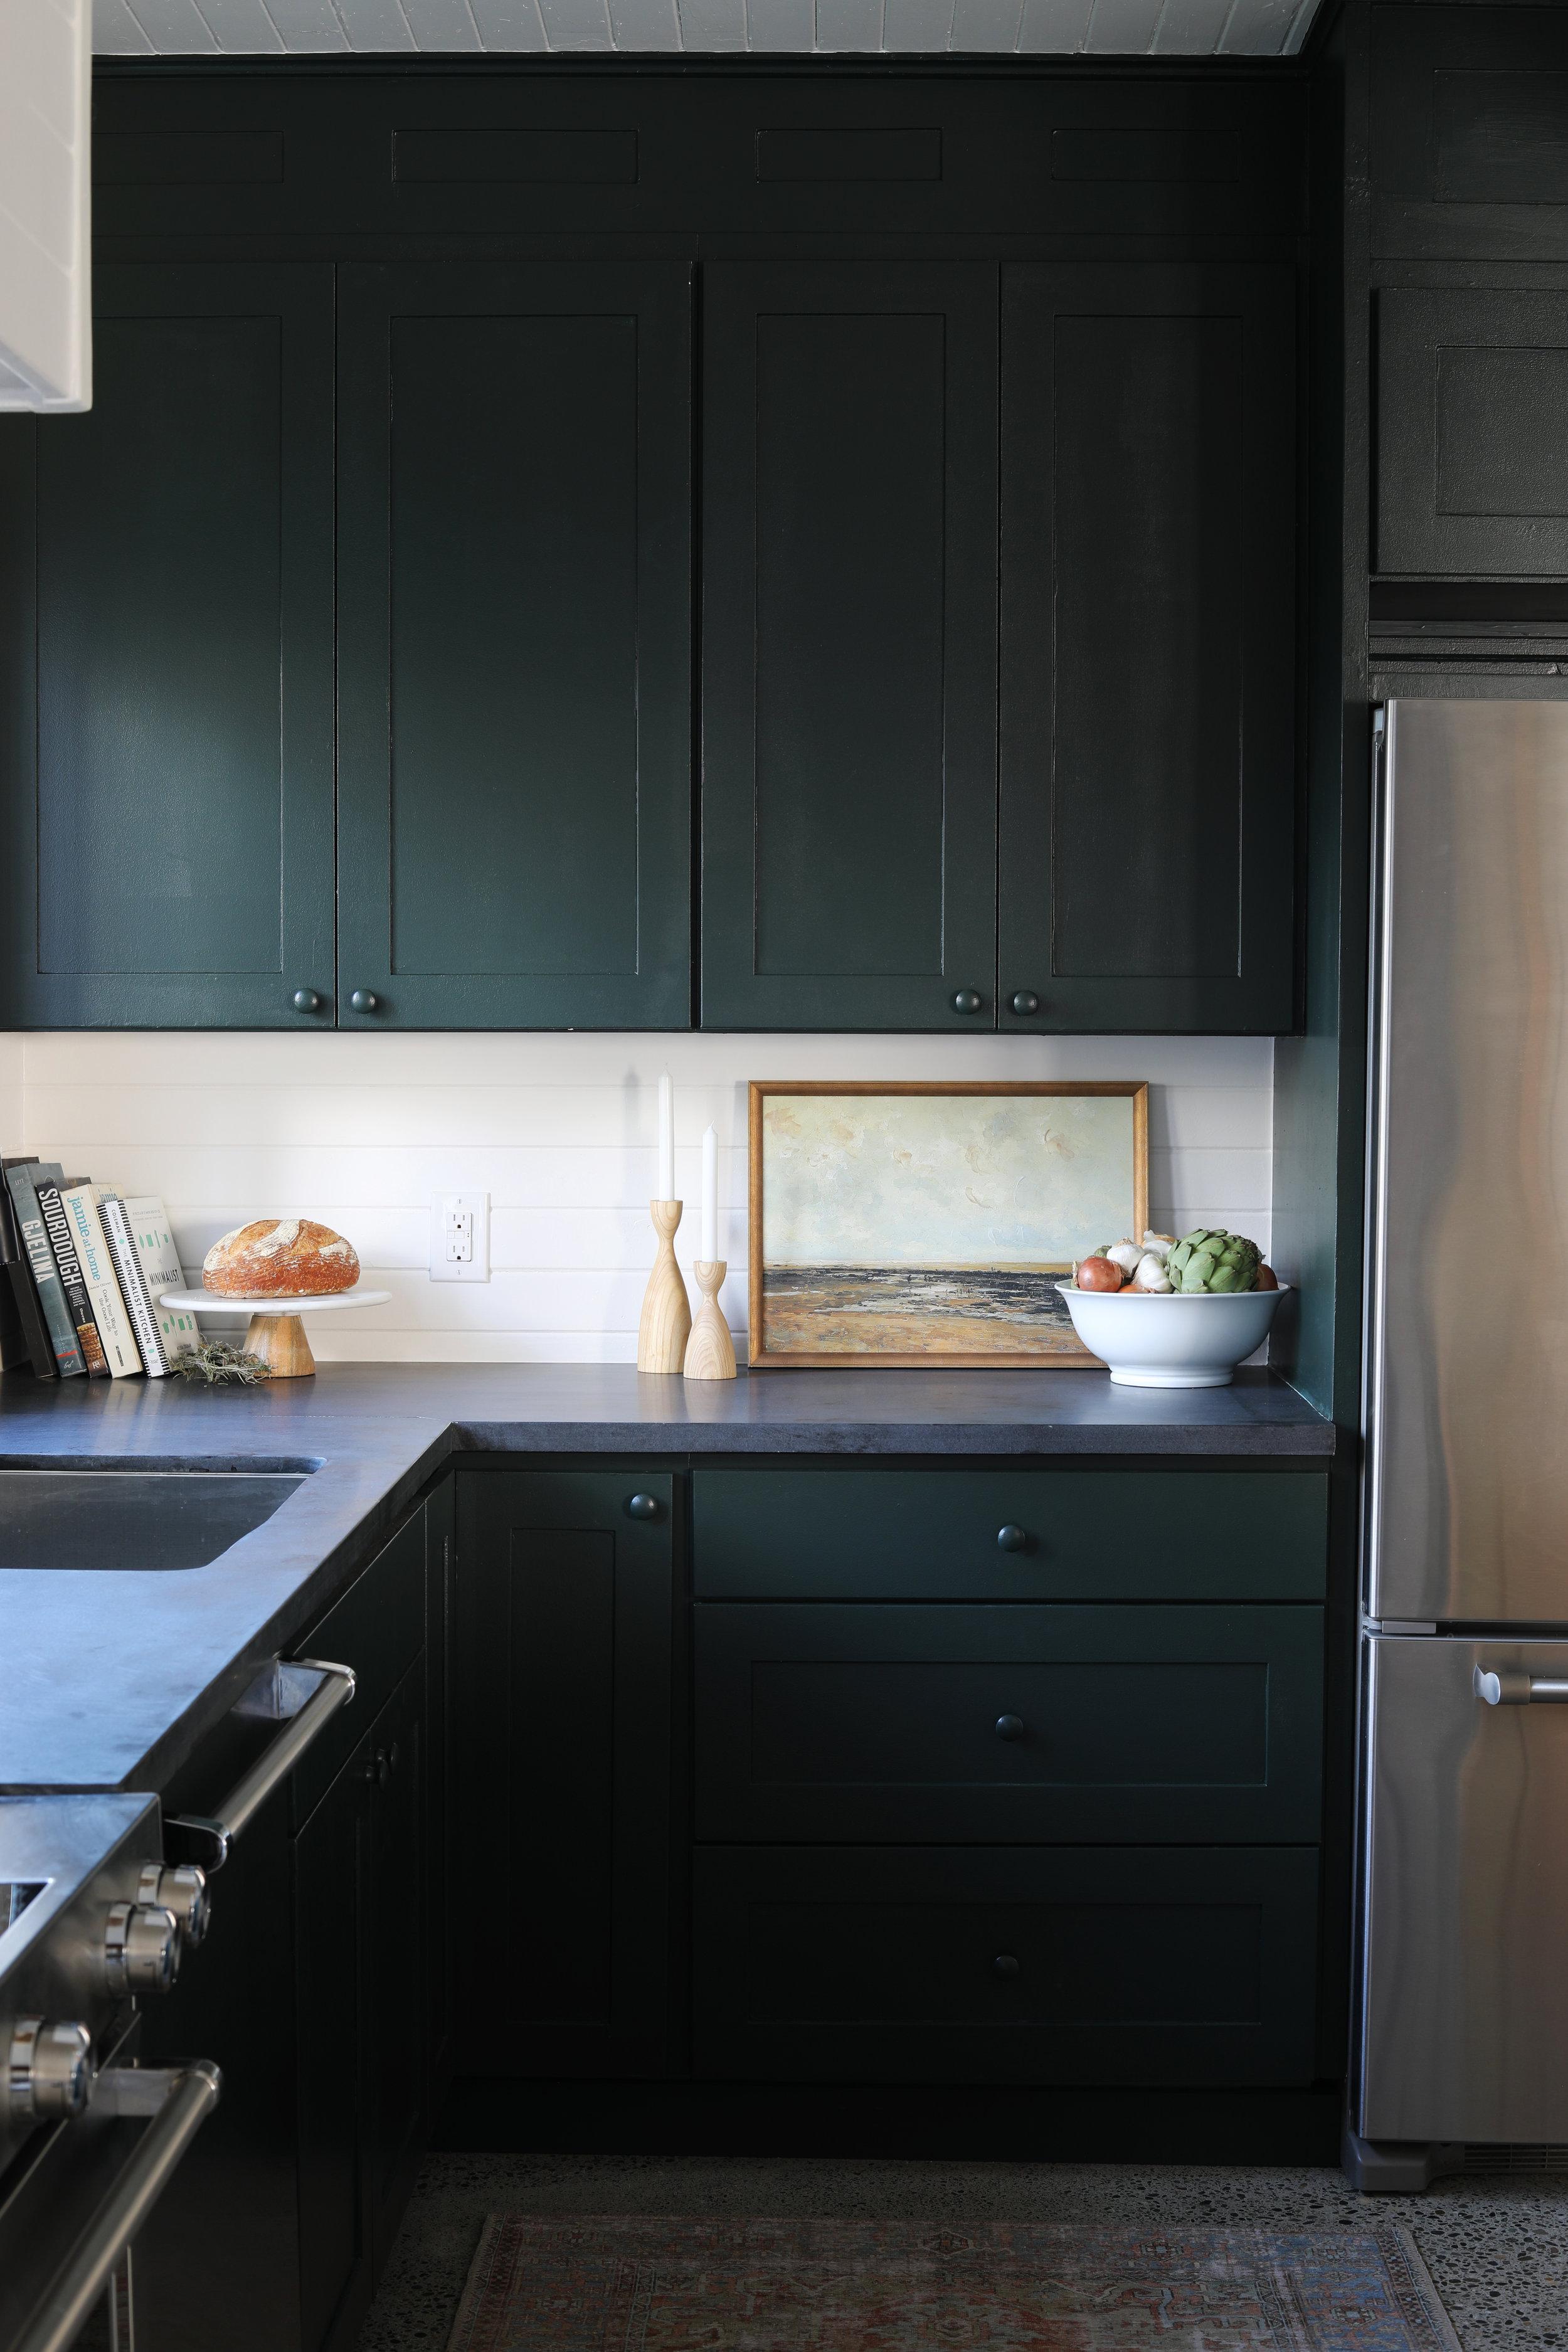 The Grit and Polish - Tacoma Kitchen Sherwin Williams Jasper Cabinets + Art.jpg